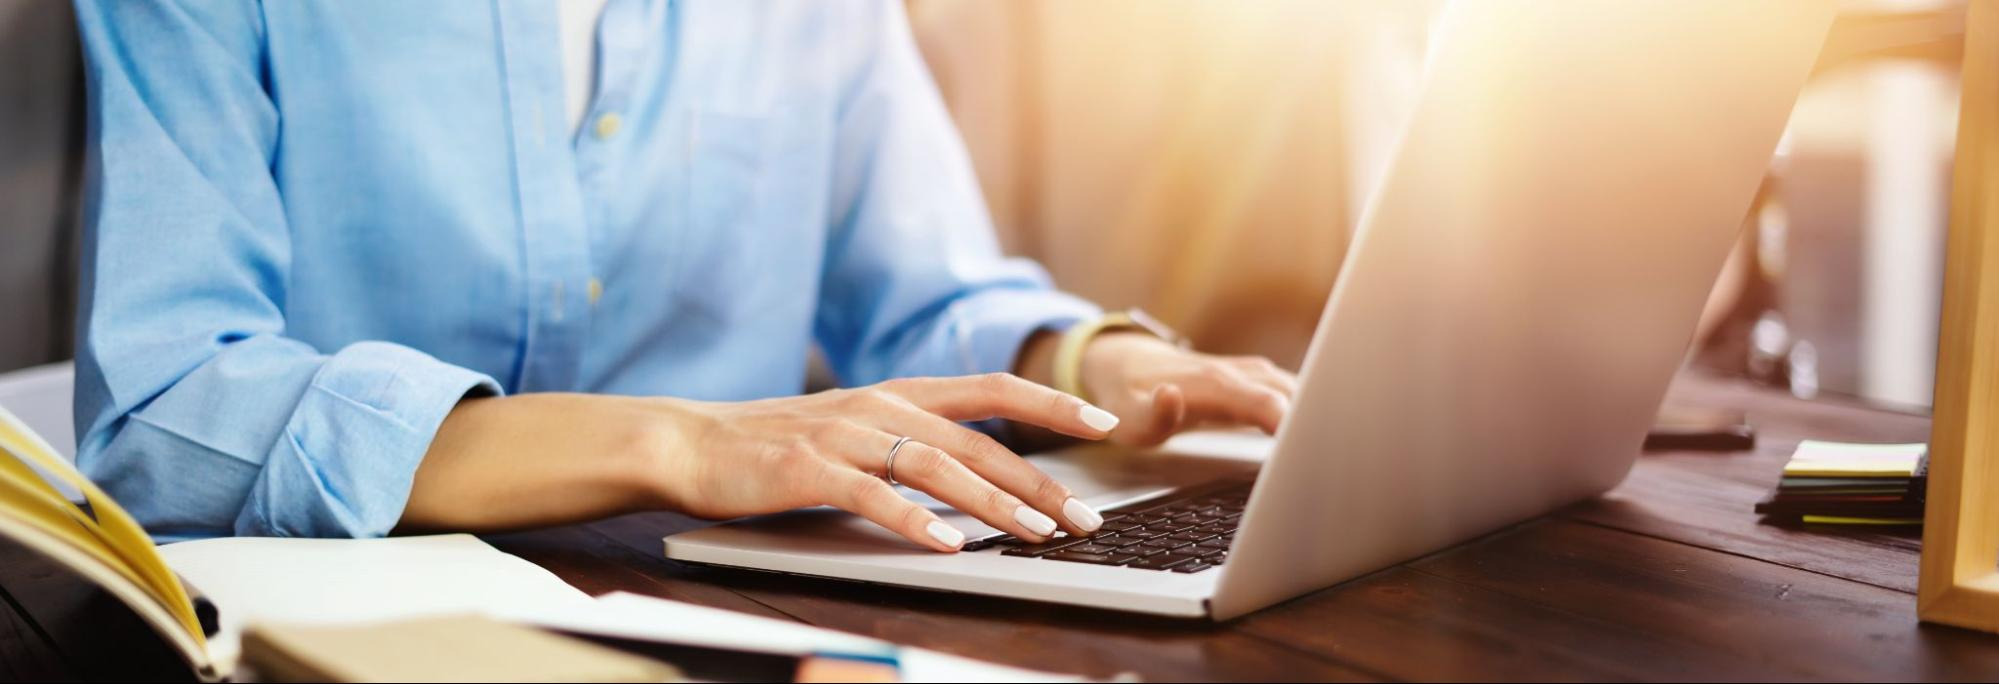 Introduction to Whitepaper Writing 【Content Marketing Basics】